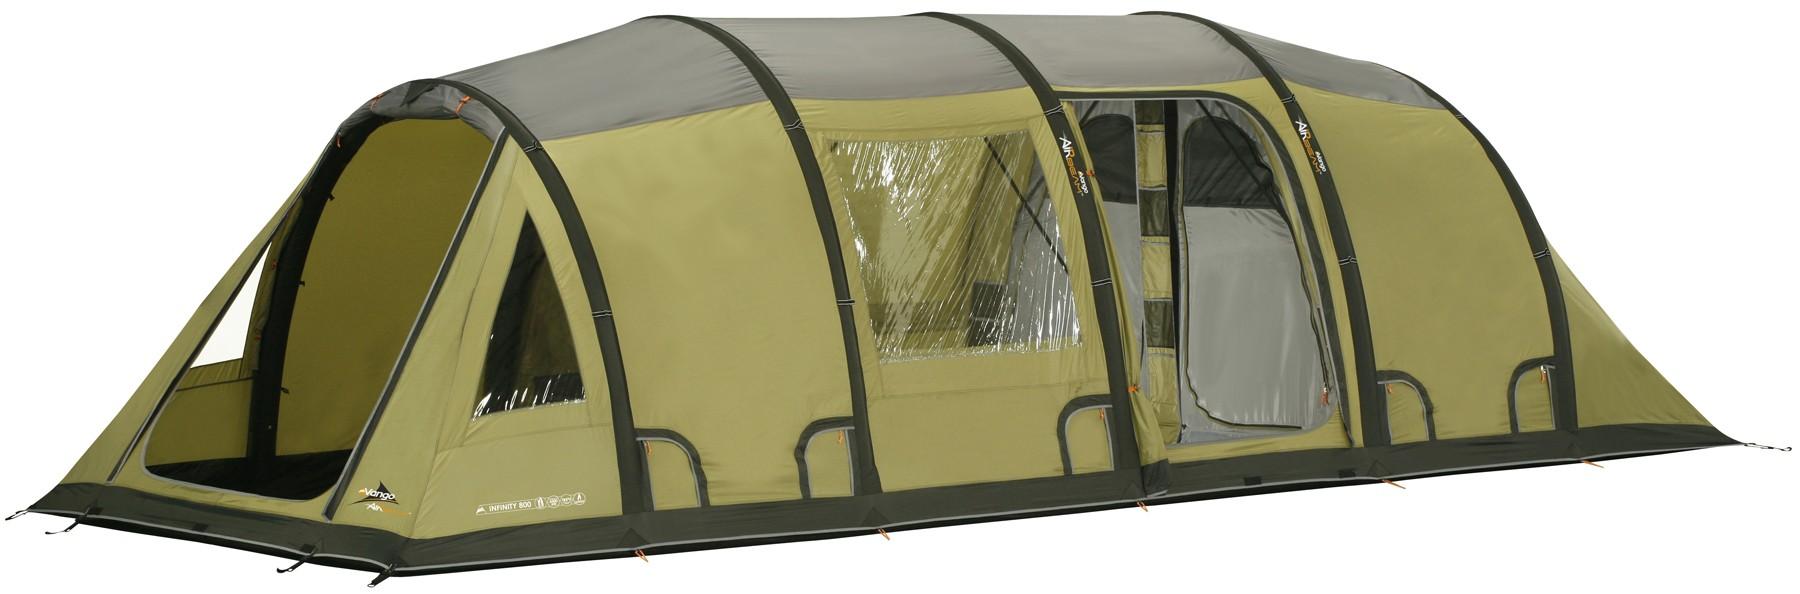 Vango Infinity 800 Airbeam Tunnel Tent From Vango For 163 900 00